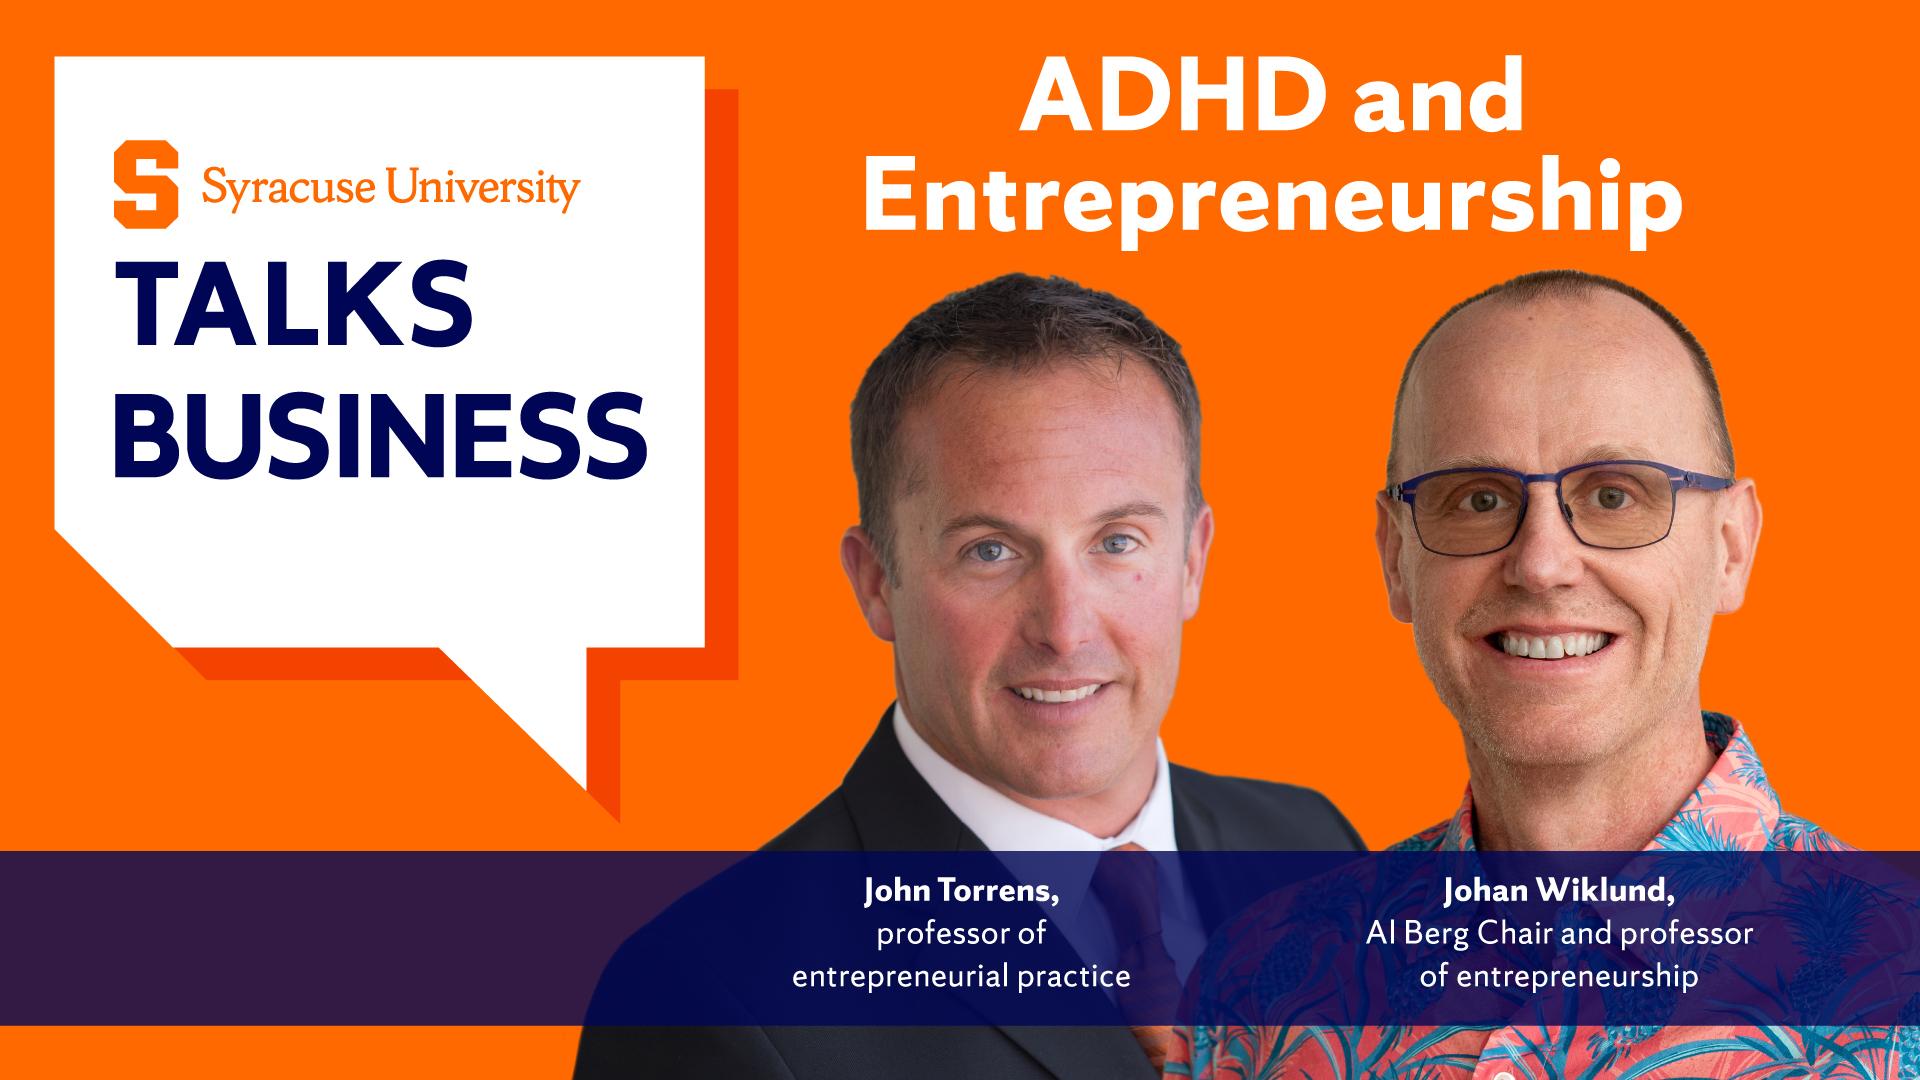 Syracuse University Talks Business podcast image, with headshots of John Torrens and Johan Wiklund